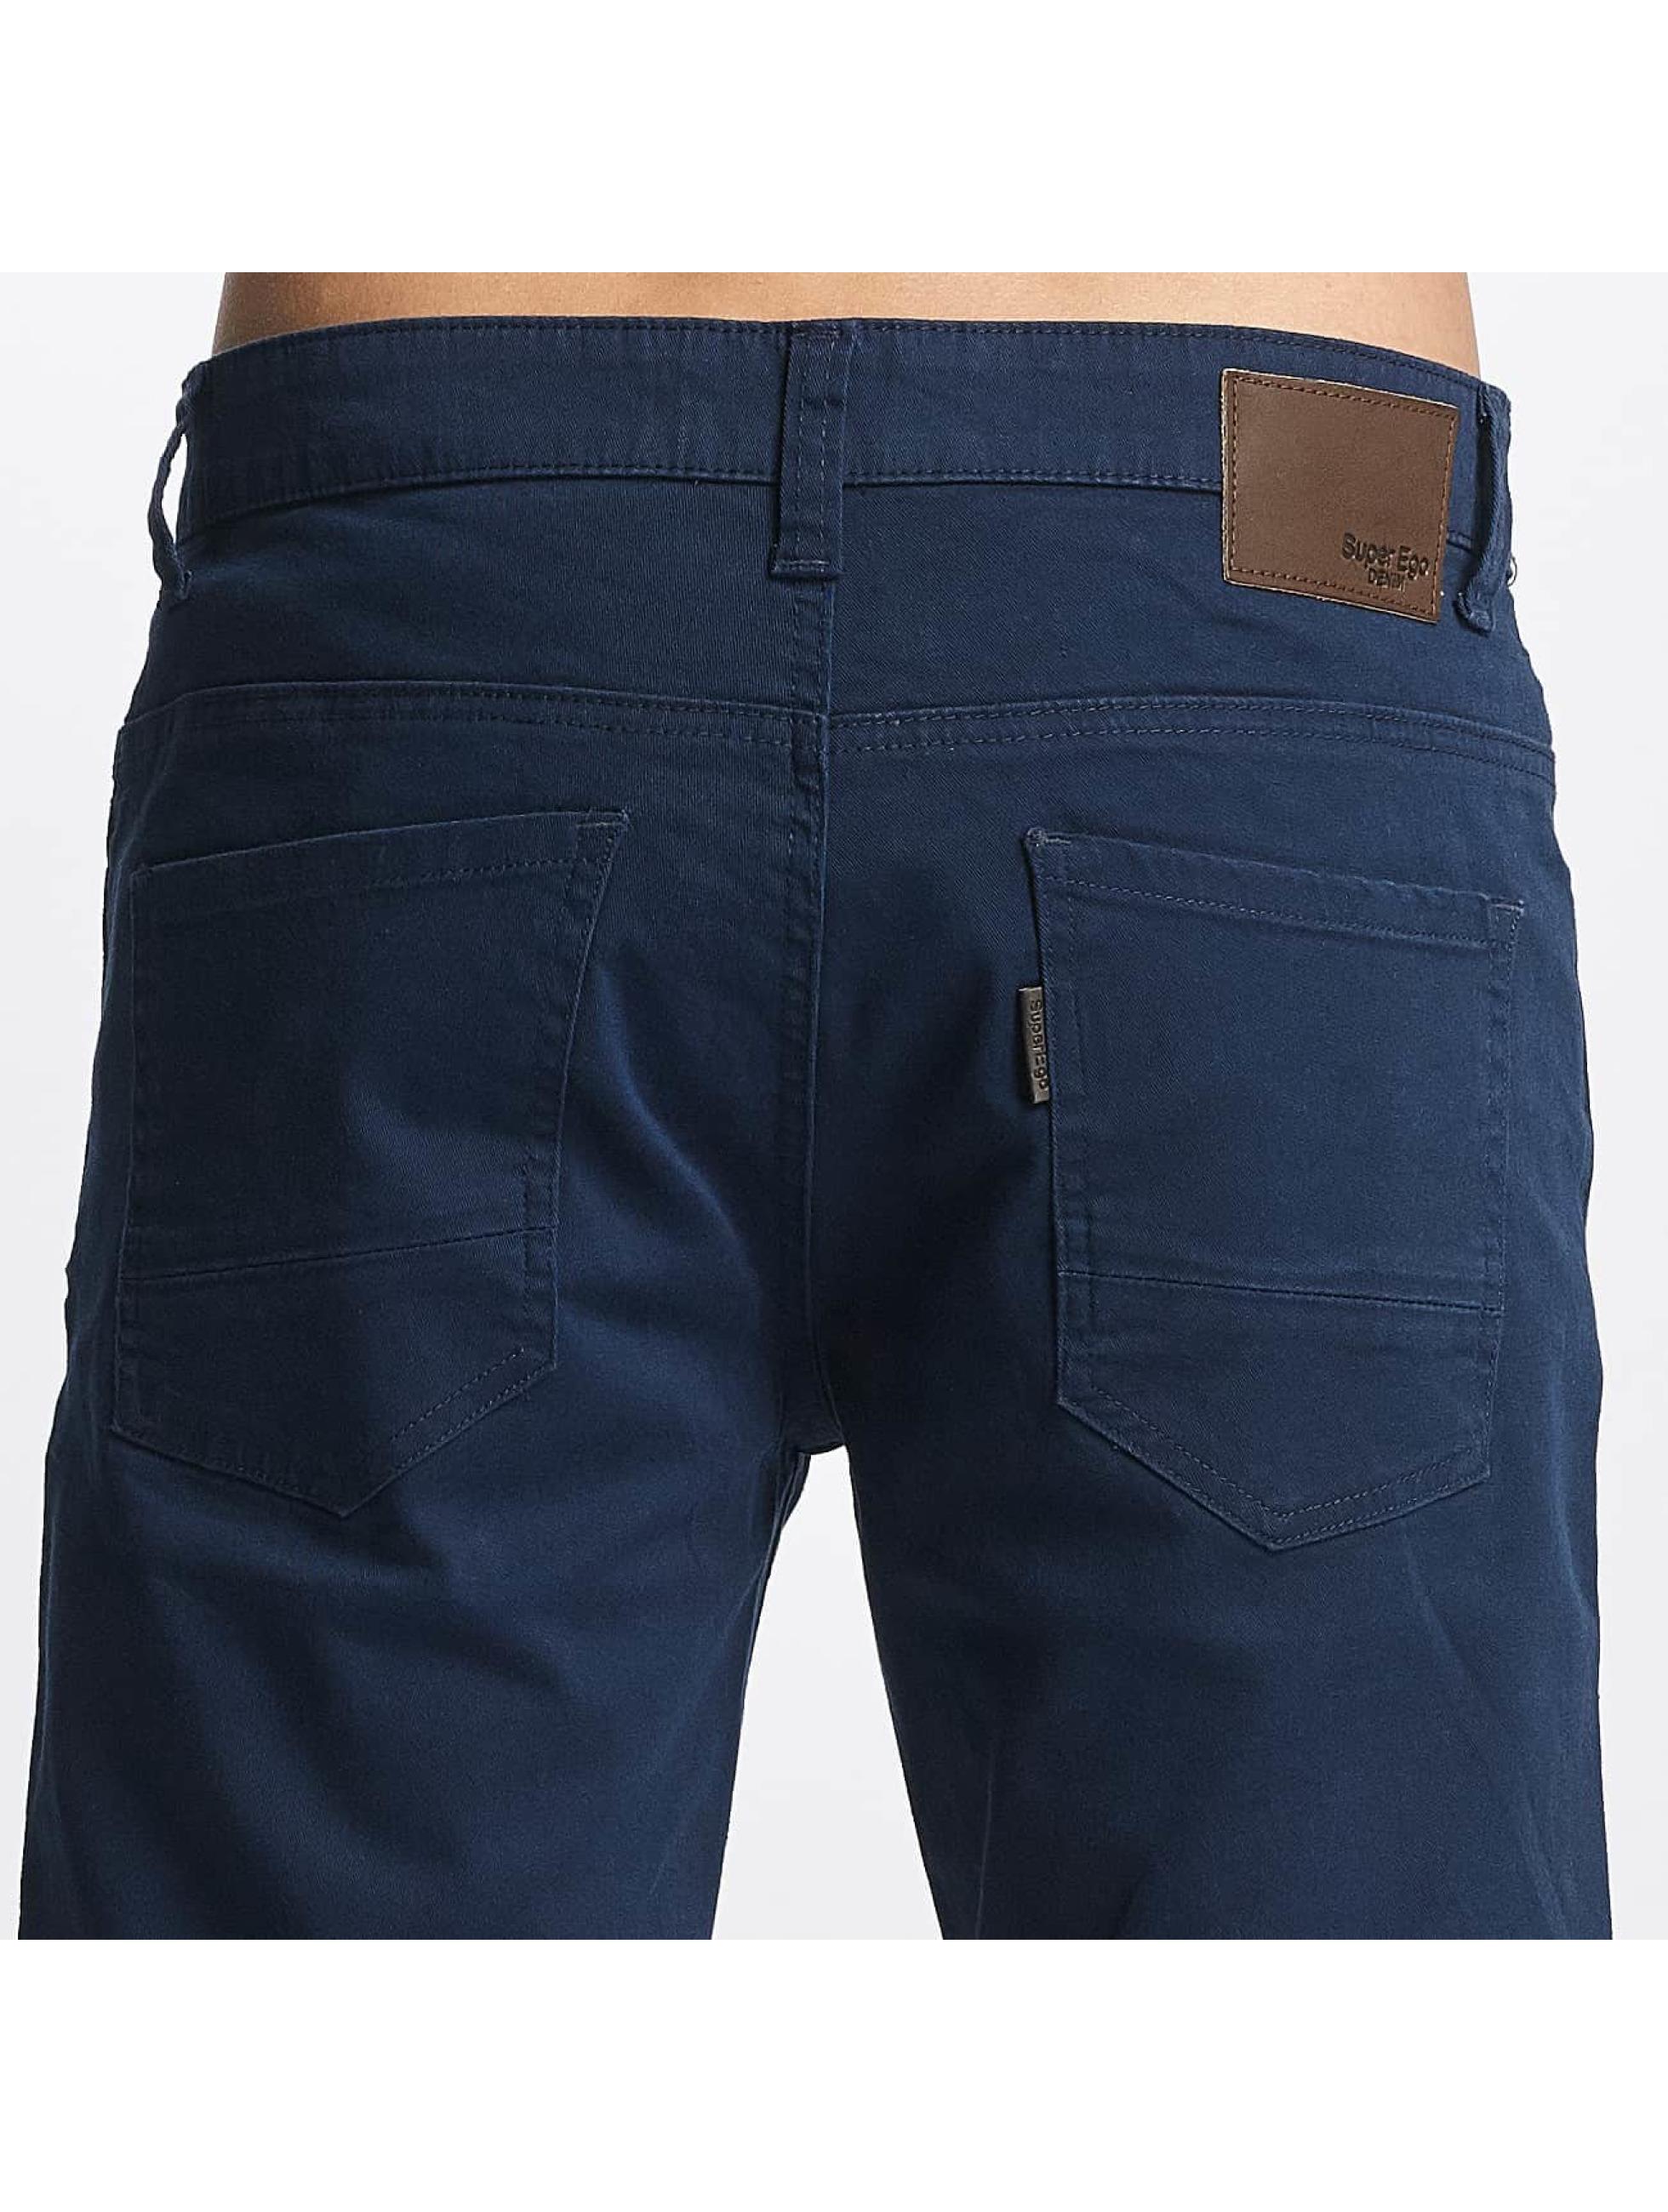 ID Denim Short Twill blue